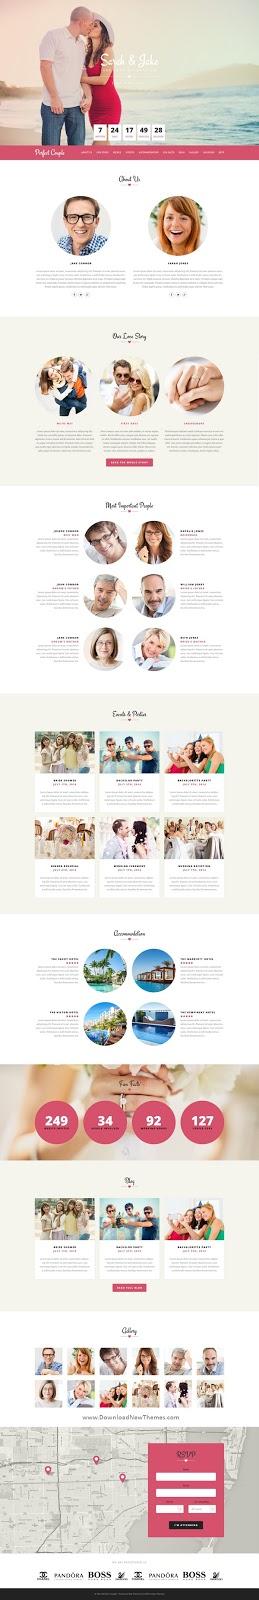 Responsive Wedding Site Template